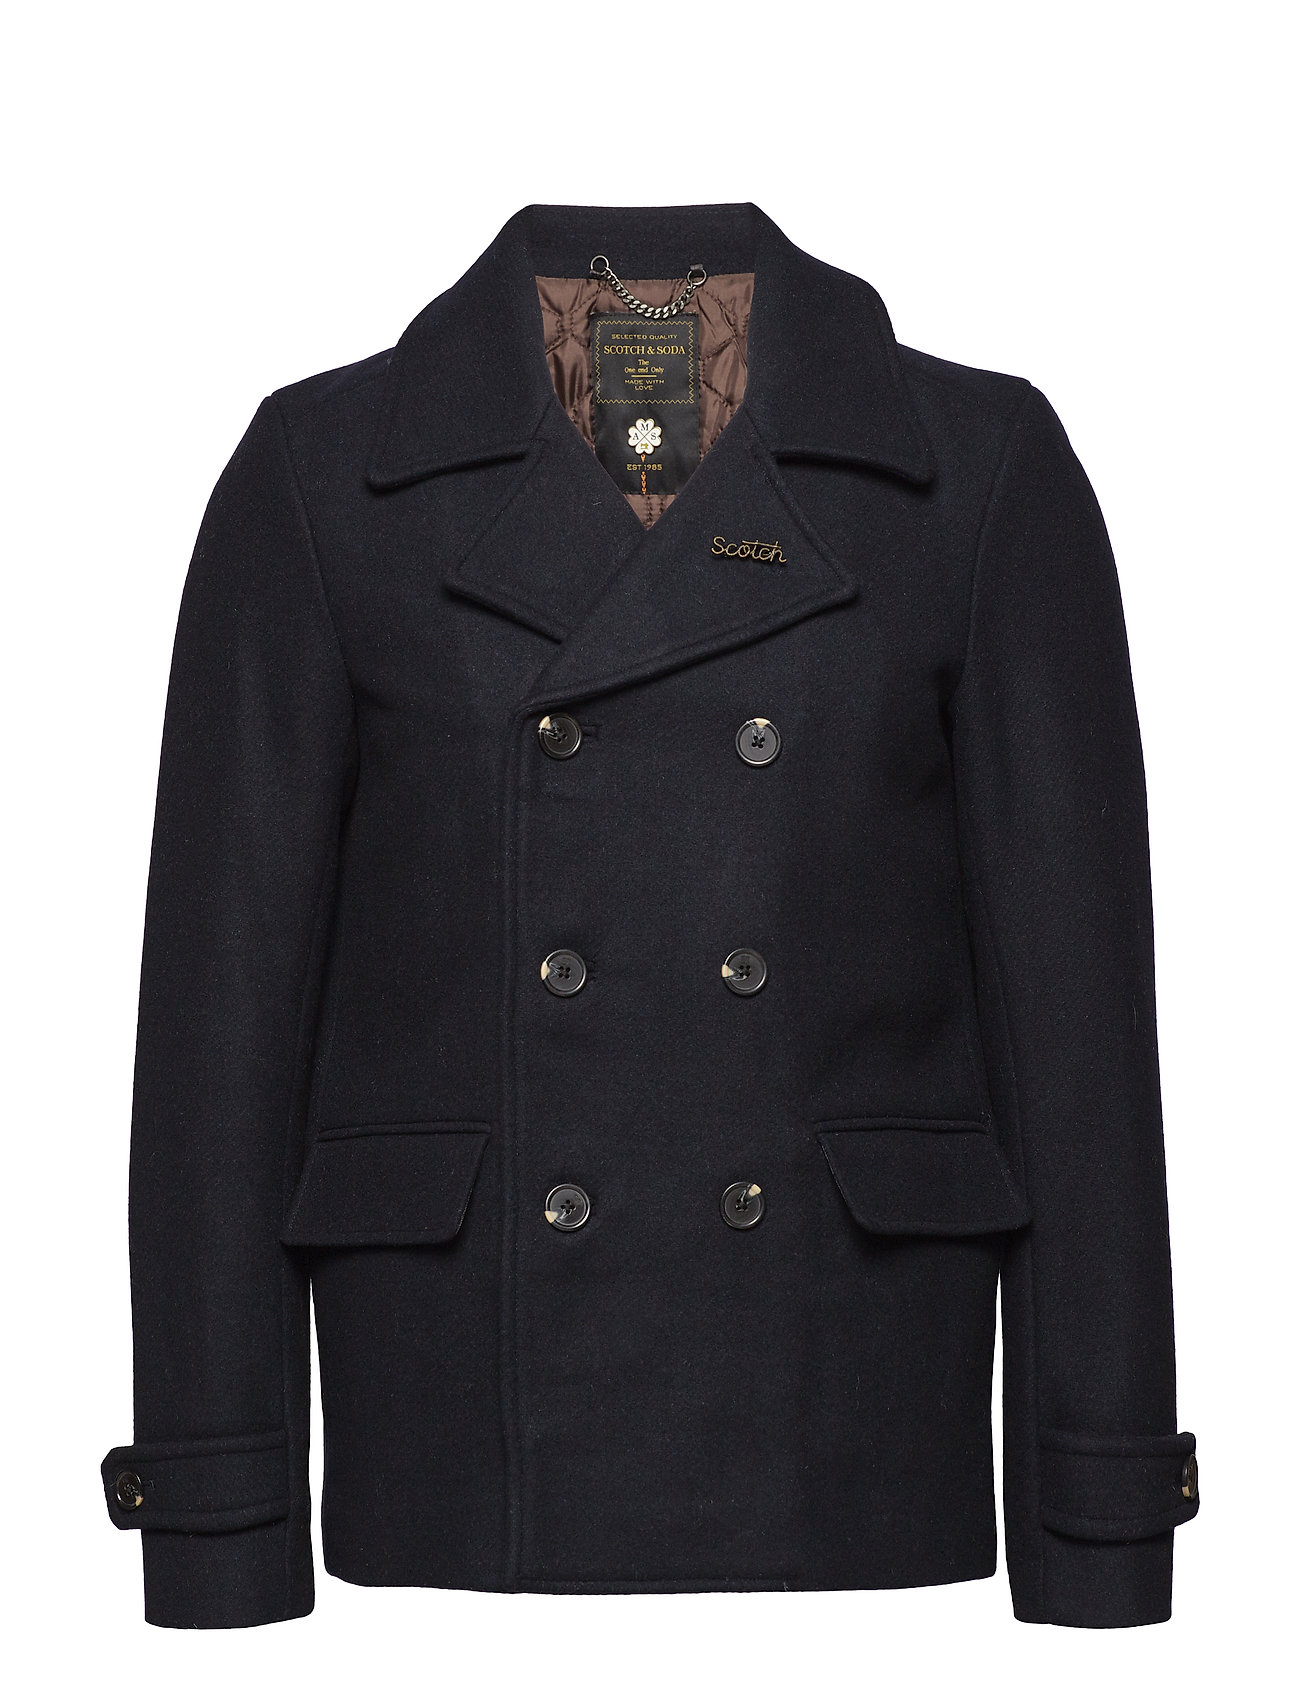 Image of Classic Caban Jacket With Quilted Lining Uldjakke Jakke Blå Scotch & Soda (3066842273)